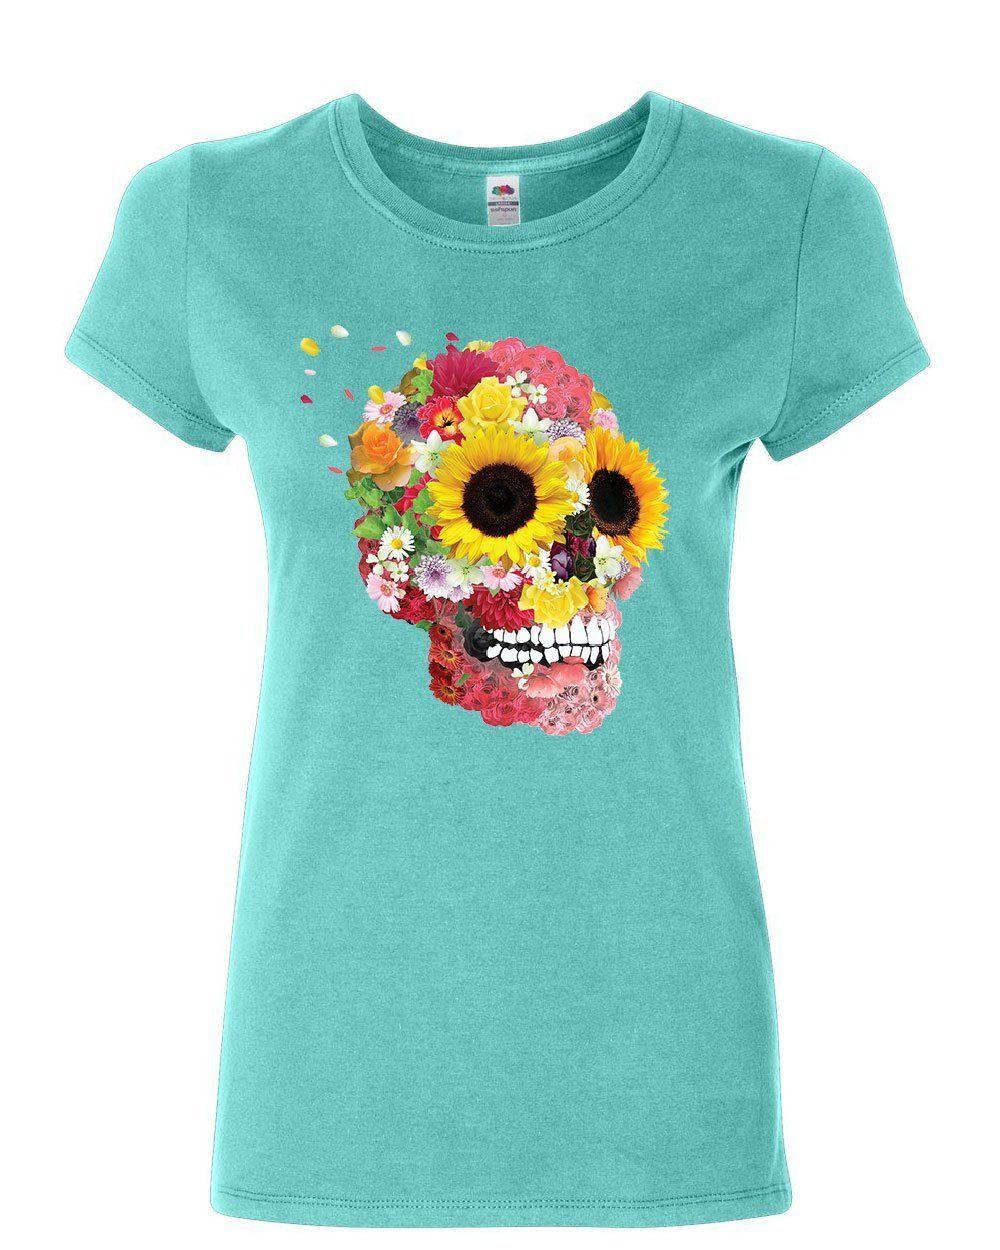 fc9eb618b48ff Sunflowers sugar skull women shirt day of the dead calavera mexico shirt  february jpg 1000x1250 Calavera